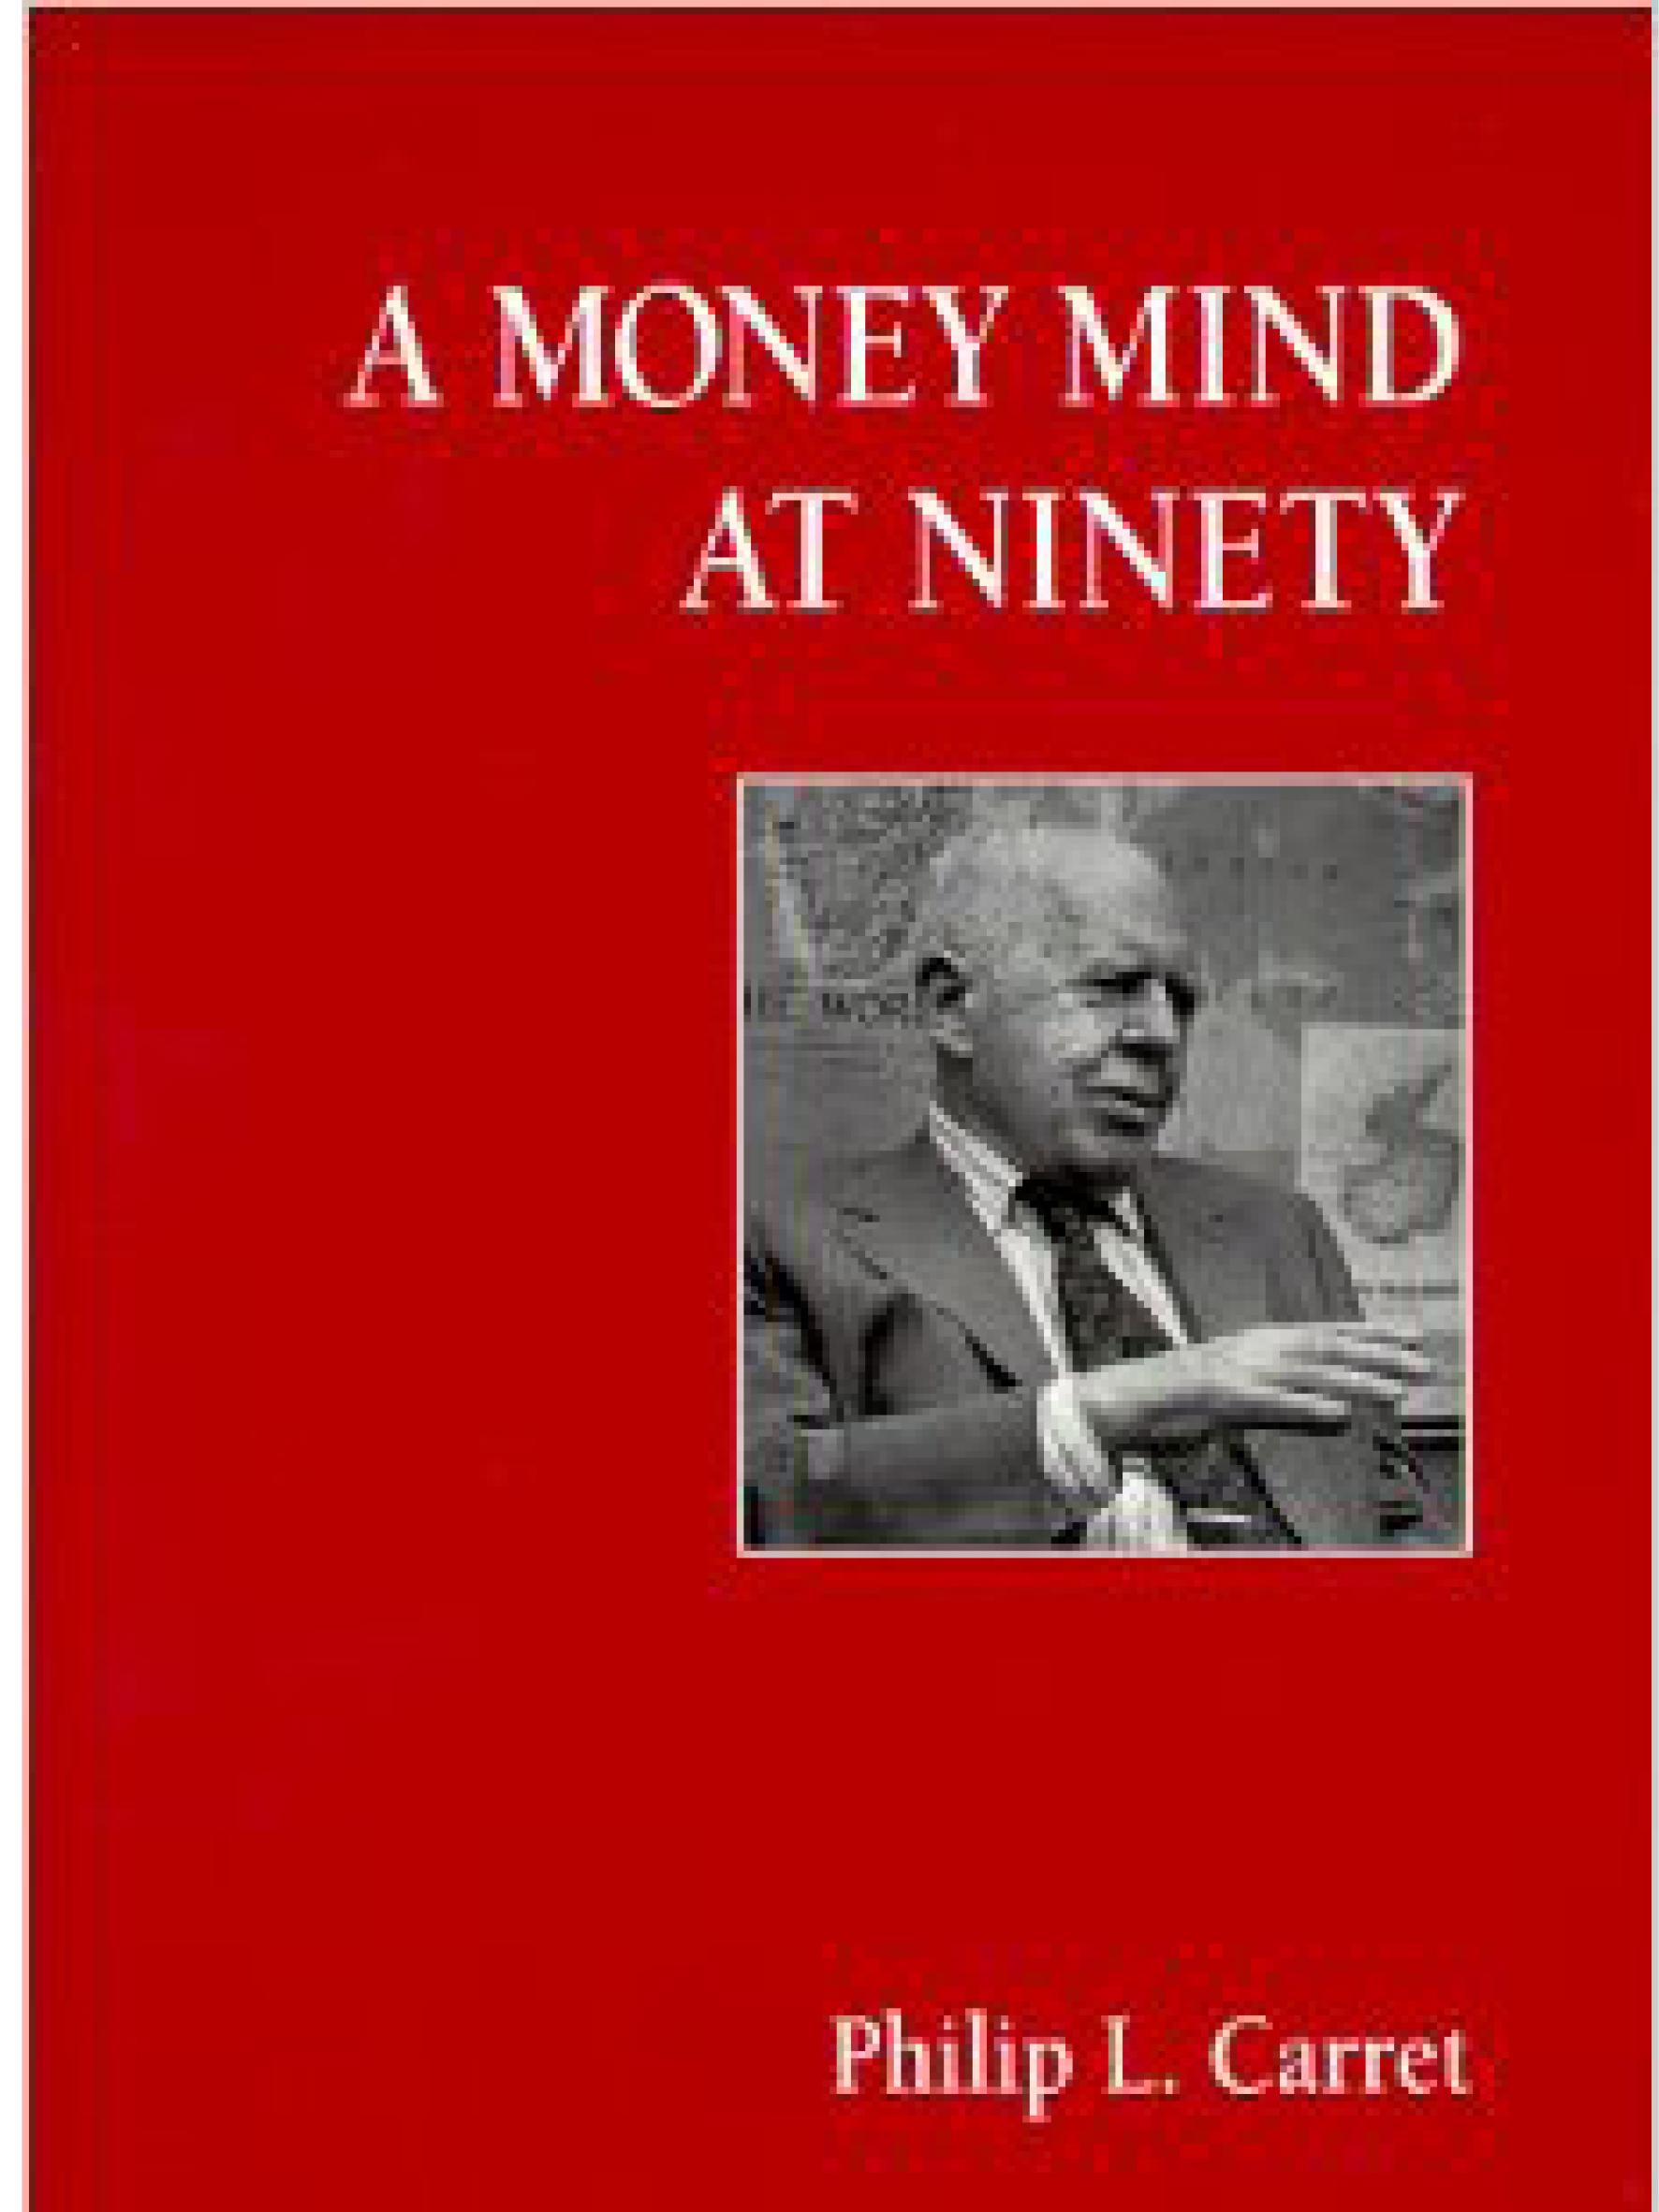 A Money Mind At Ninety.     Philip L. Caret    1991